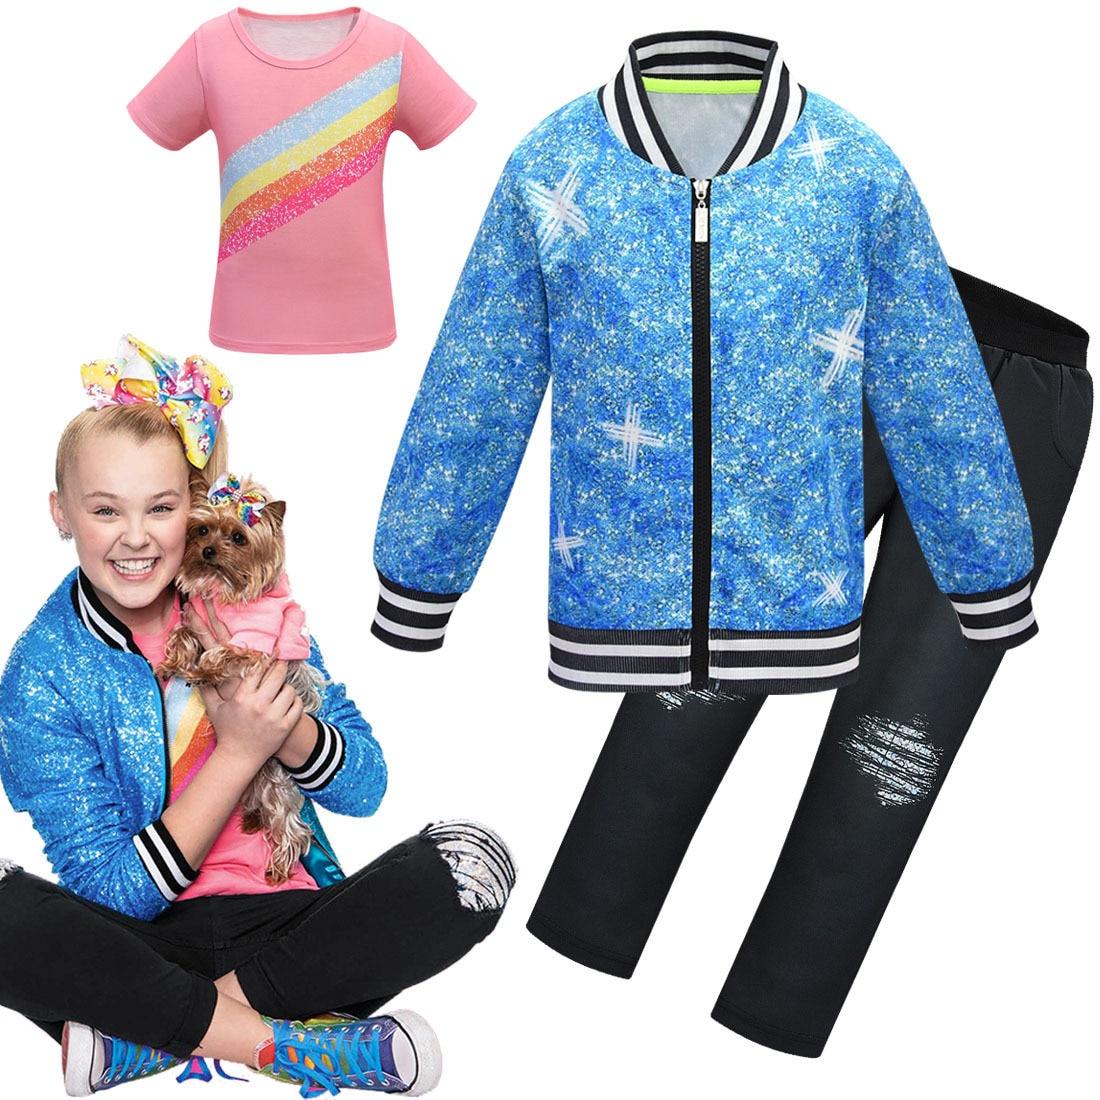 Girls Jojo Siwa Clothing Suit Autumn Baseball Uniform Coat T Shirt Pants 3 Pcs Sport Suits Kids Cartoon Clothes Girls Outfits